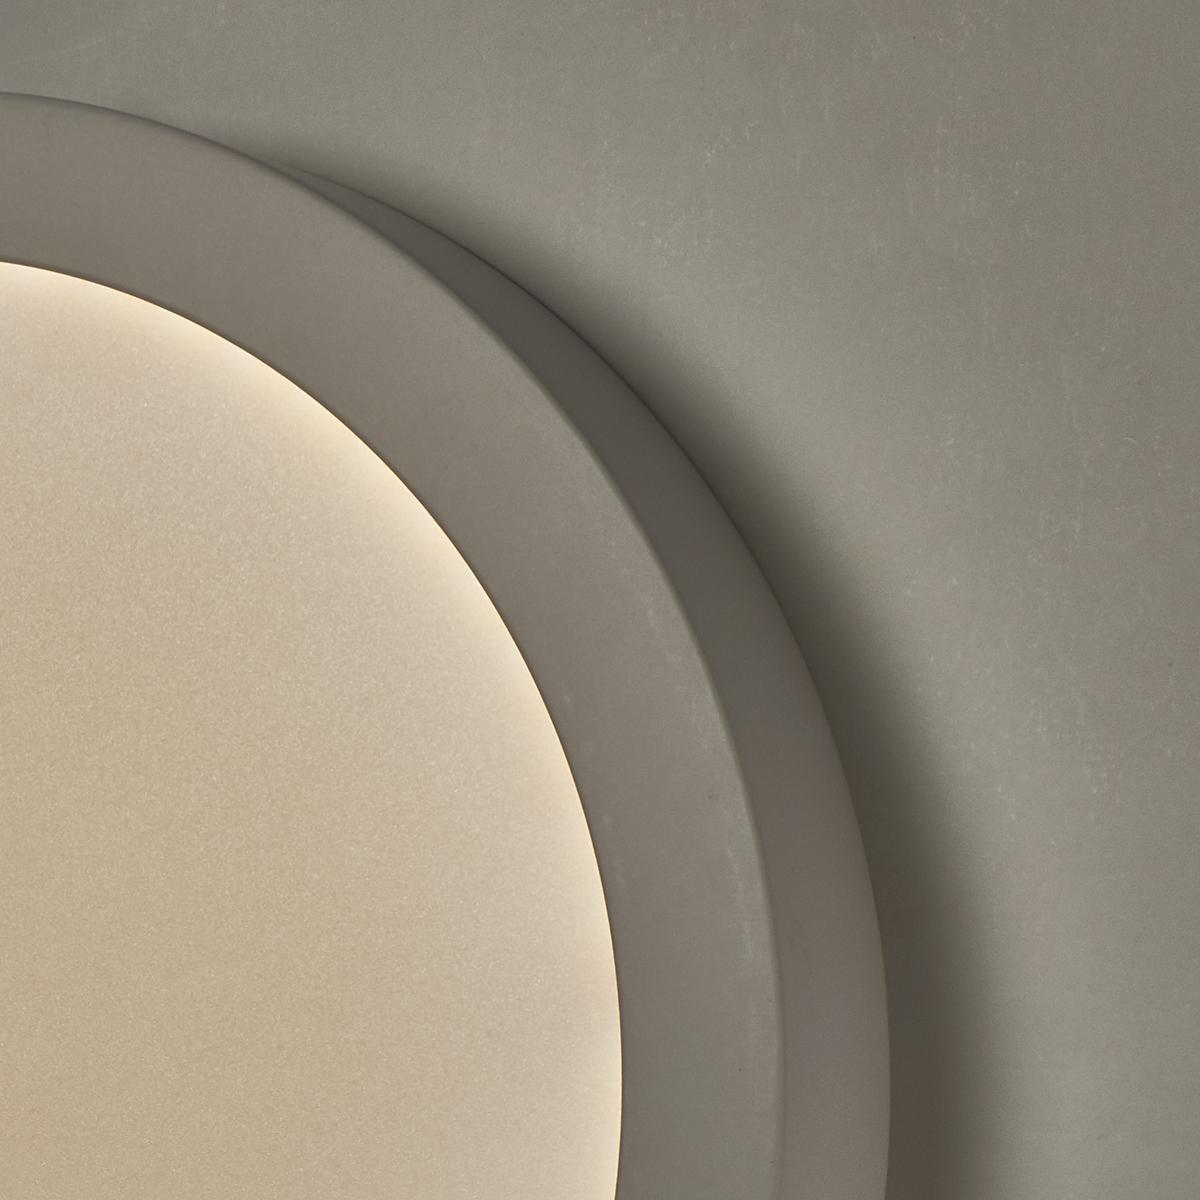 WiFi - Smart LED plafondlamp - 18 watt - 30cm - warm tot koel wit - 18 watt - dimbaar - app besturing - lichtkleur